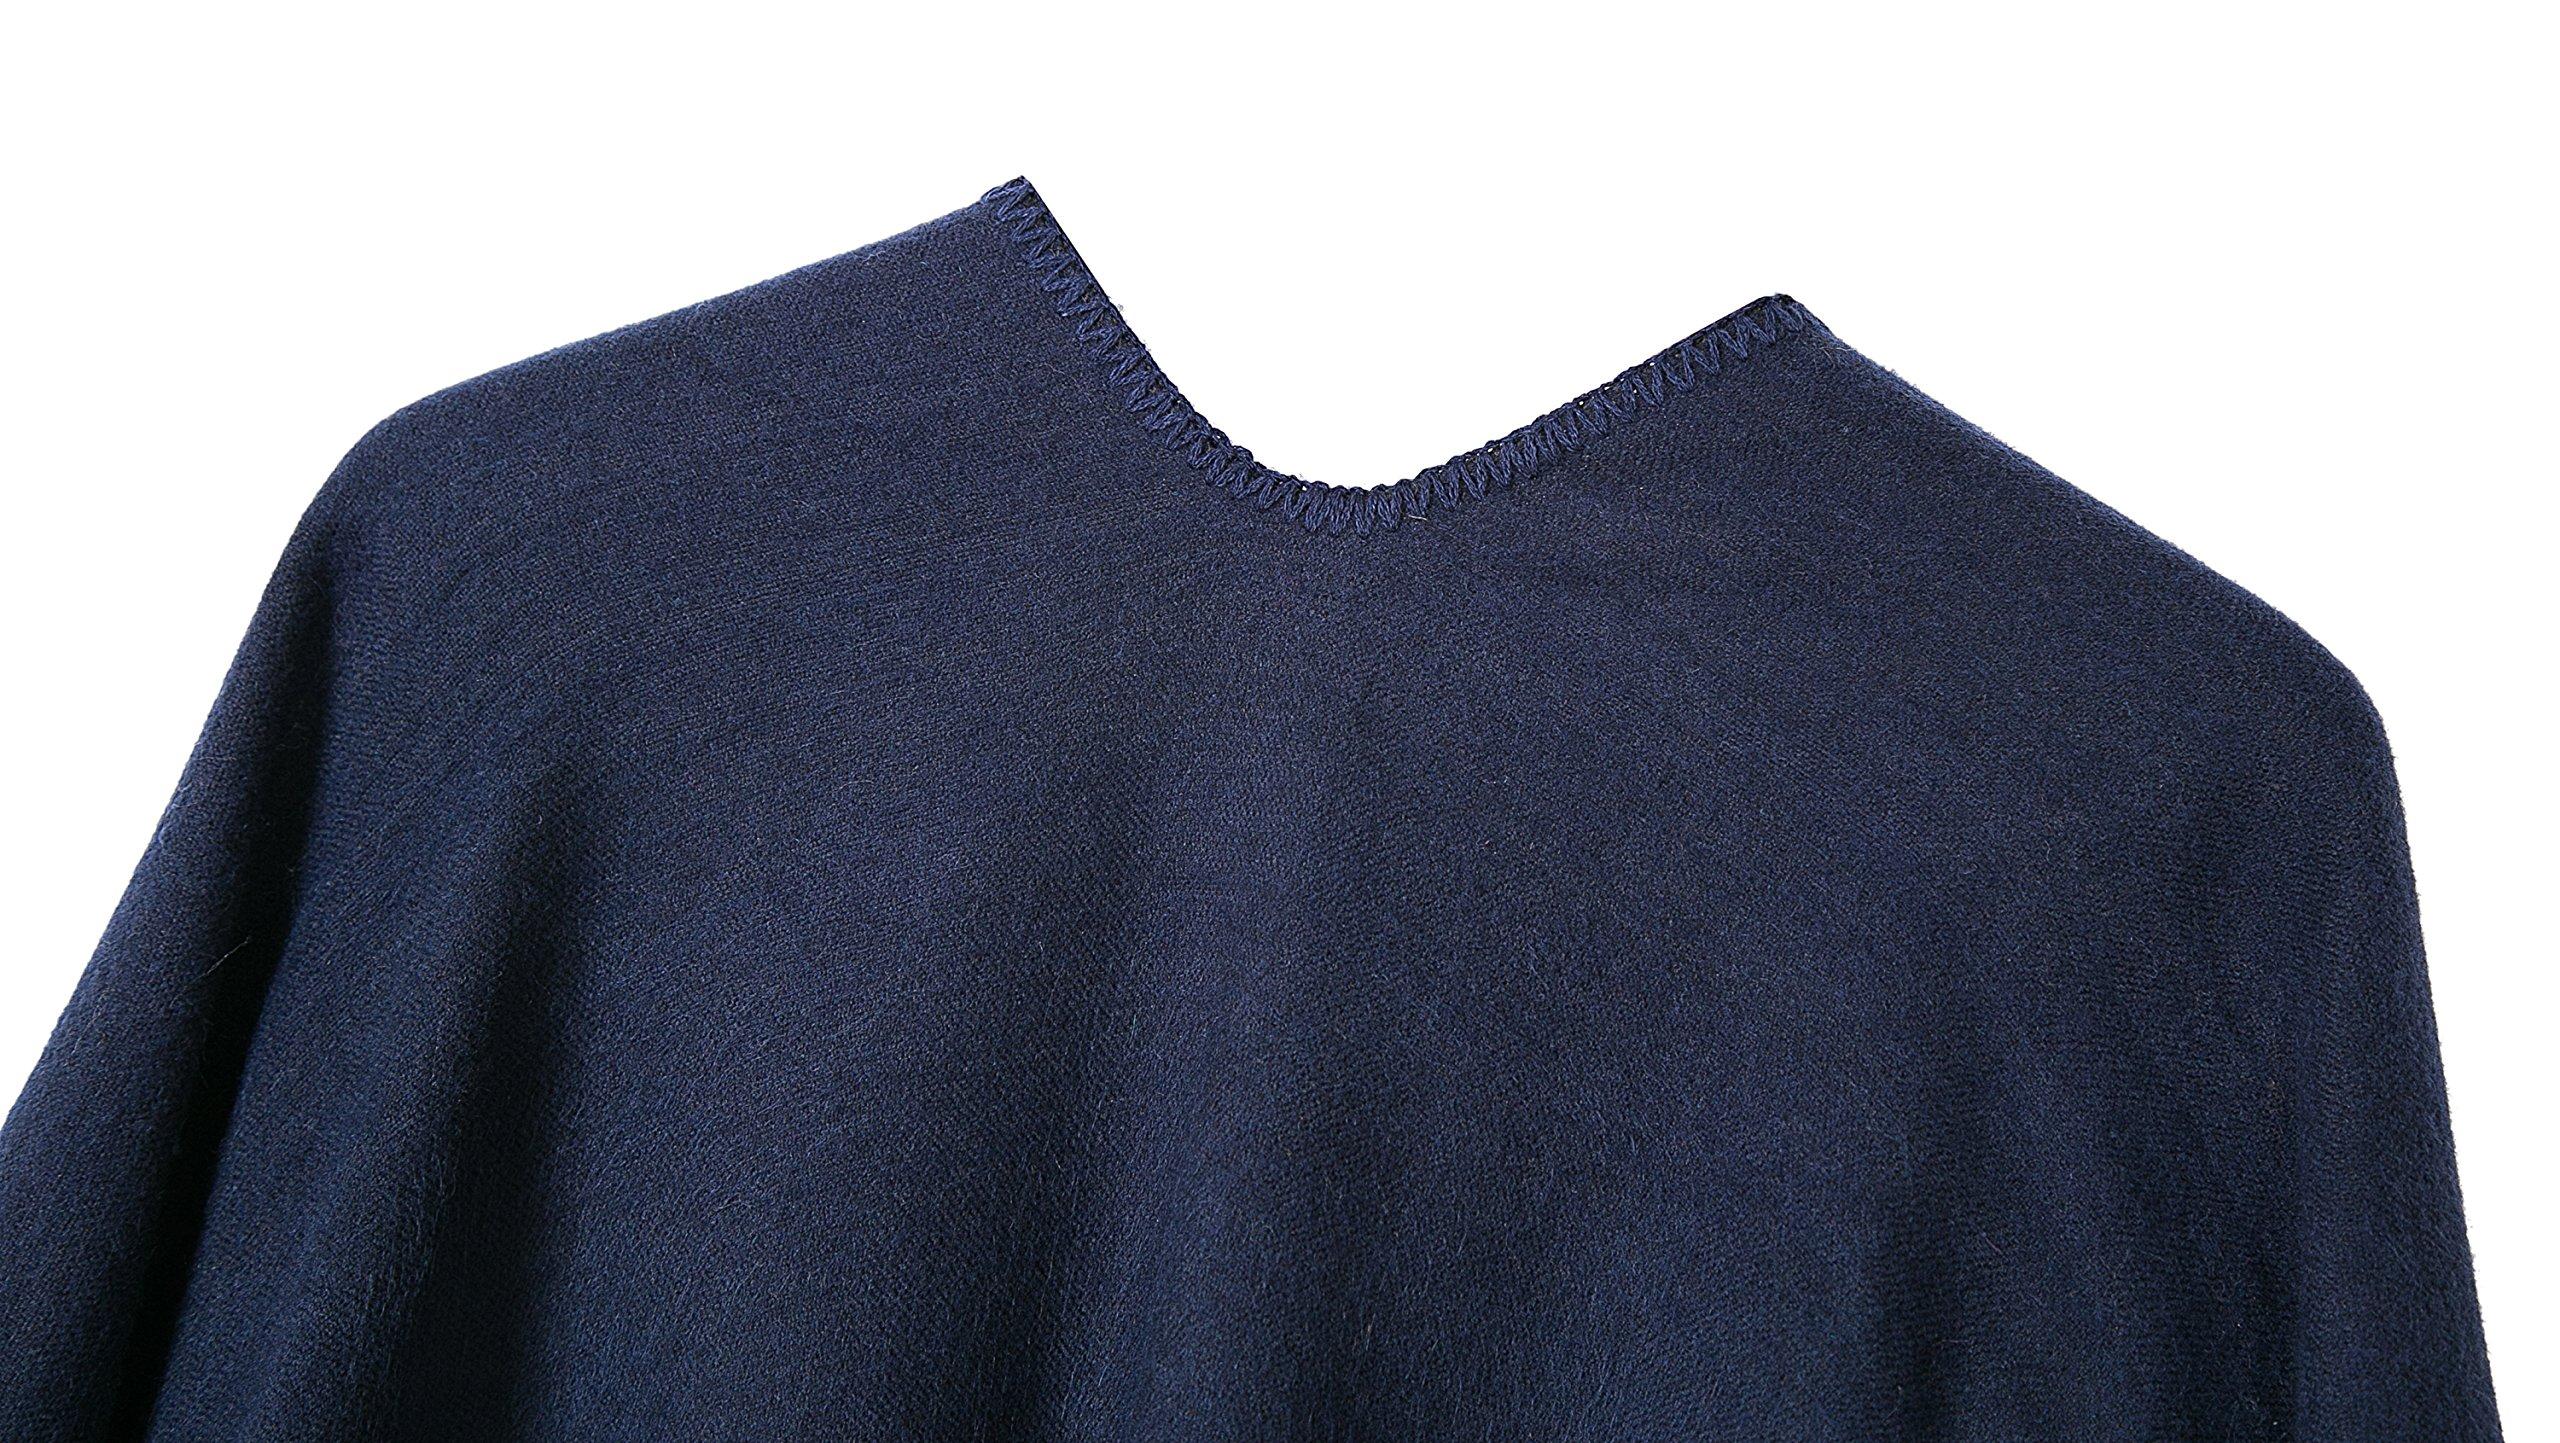 83ce13585ff6b Urban CoCo Women s Color Block Shawl Wrap Open Front Poncho Cape (Series  7-navy blue)